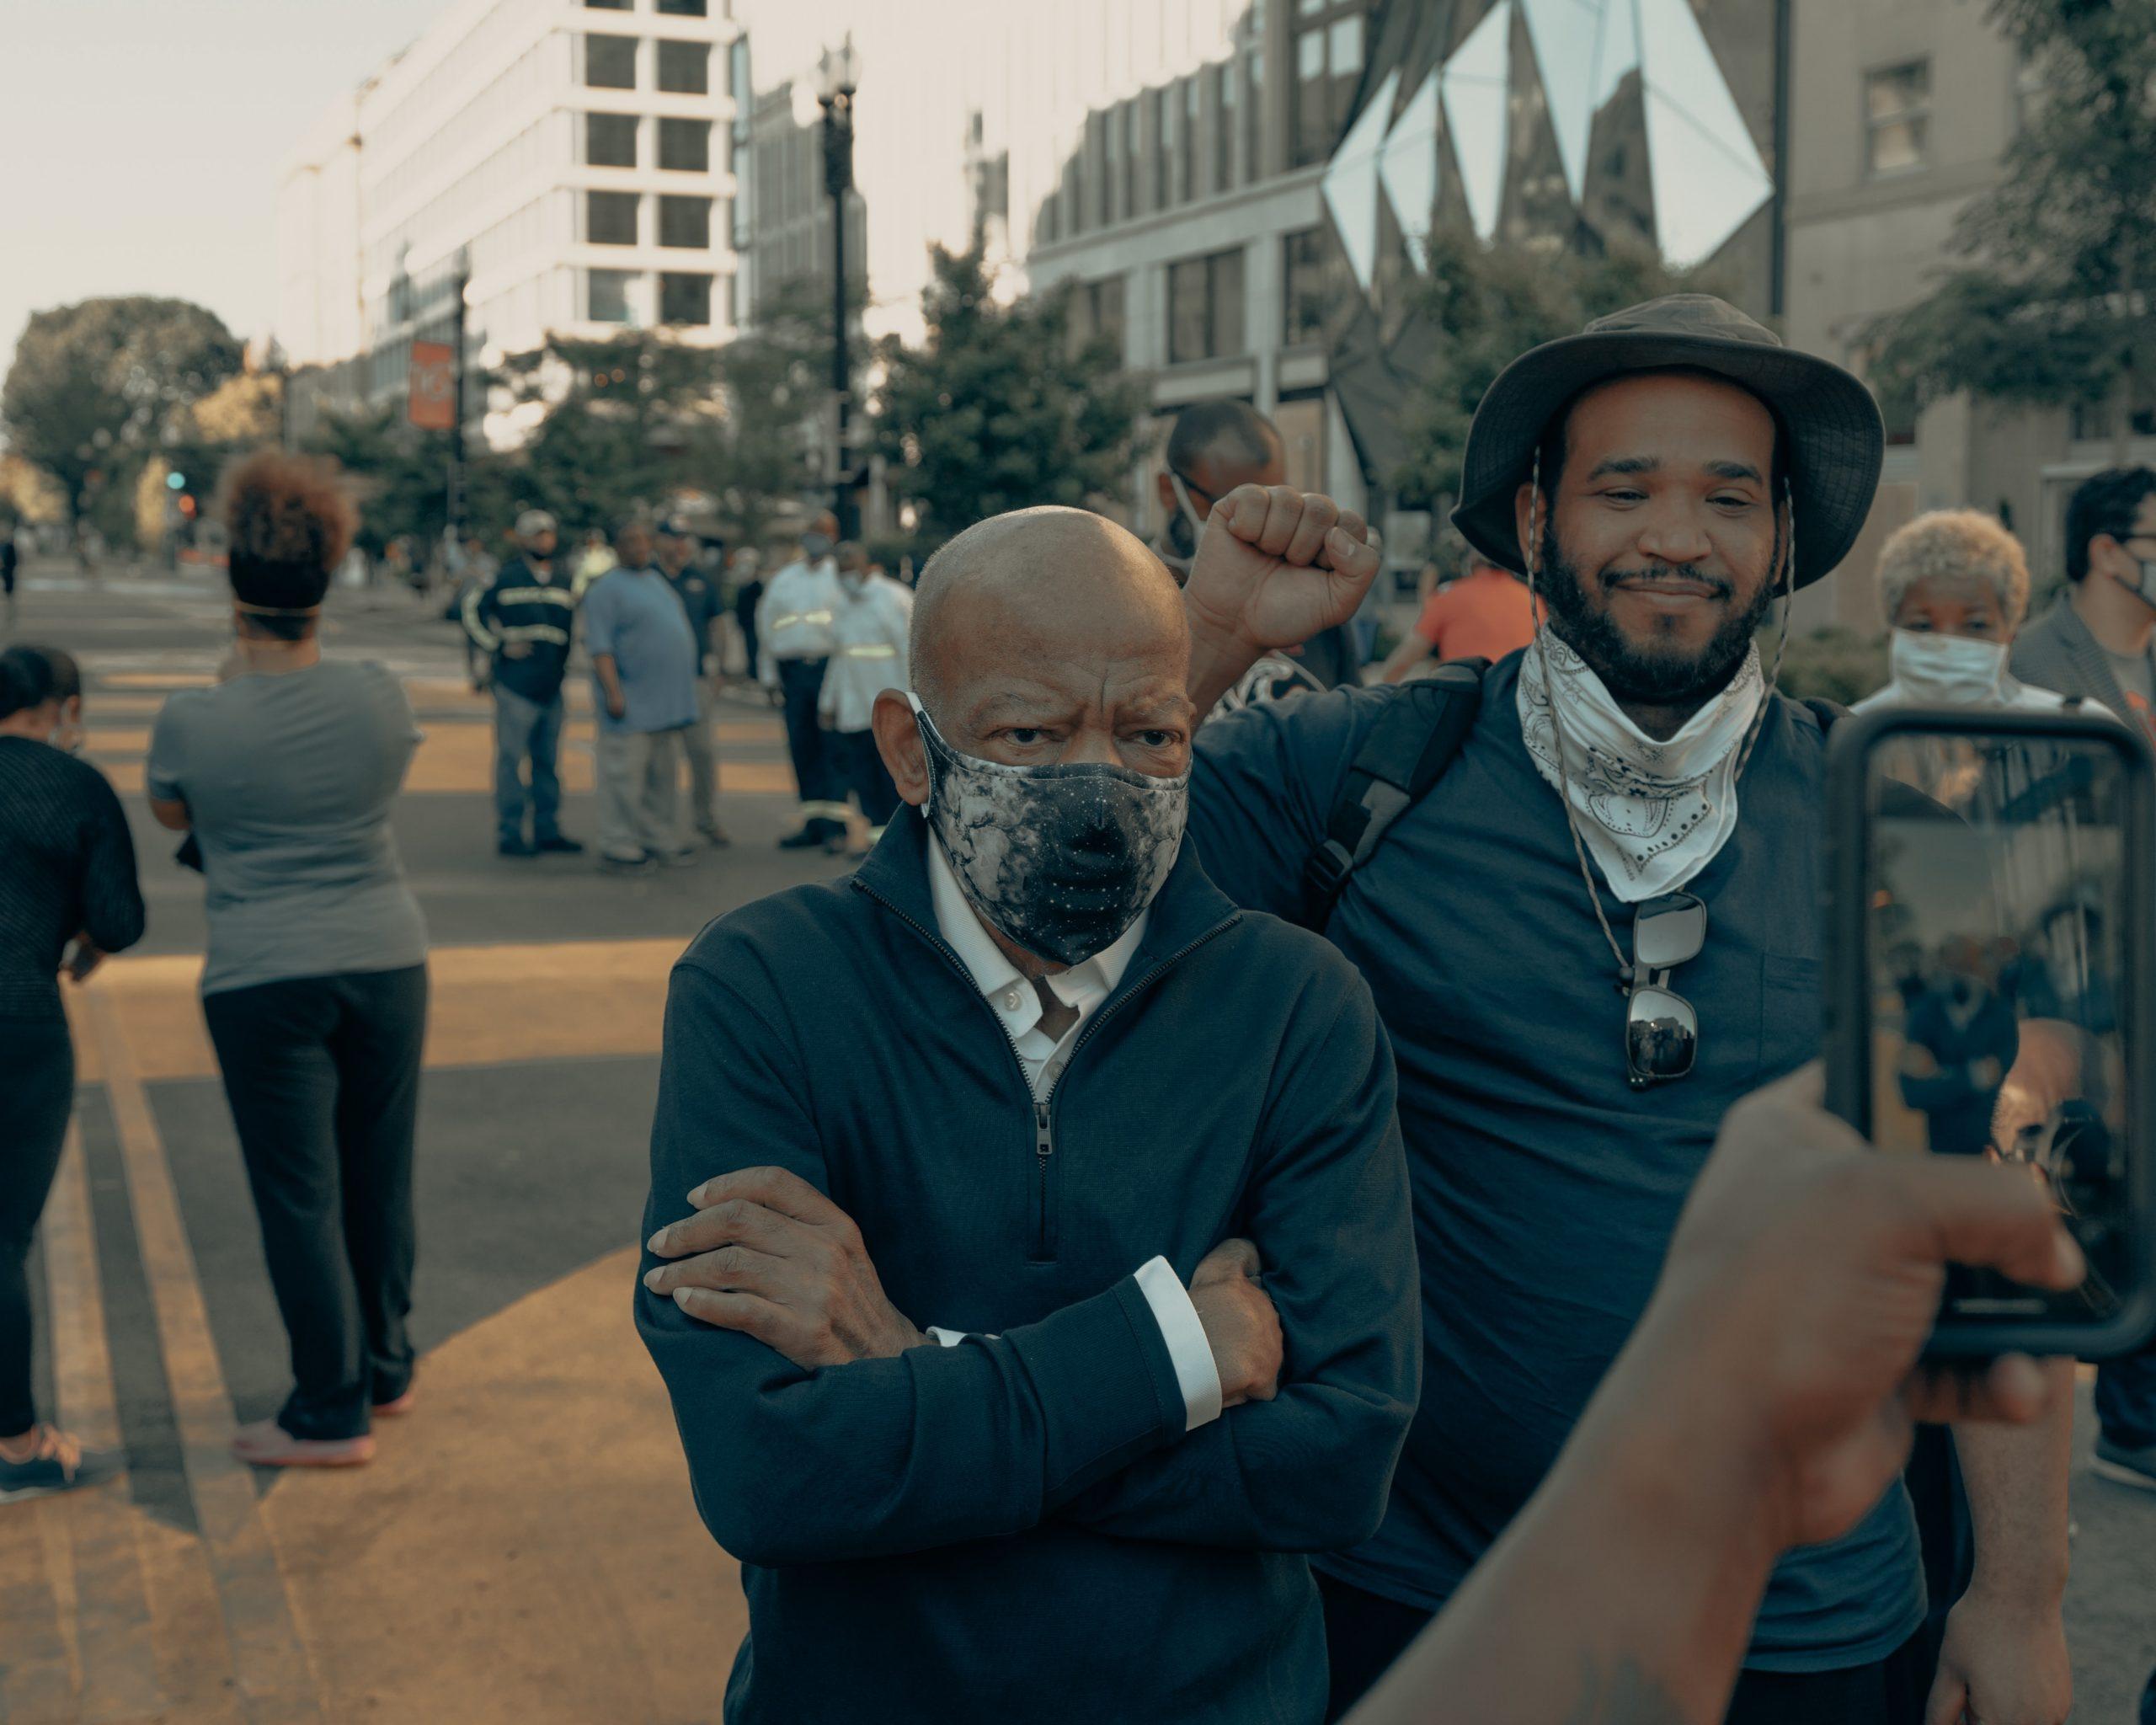 U.S. Representative John Lewis poses for a photo at Black Lives Matter plaza in Washington DC (IG: @clay.banks)